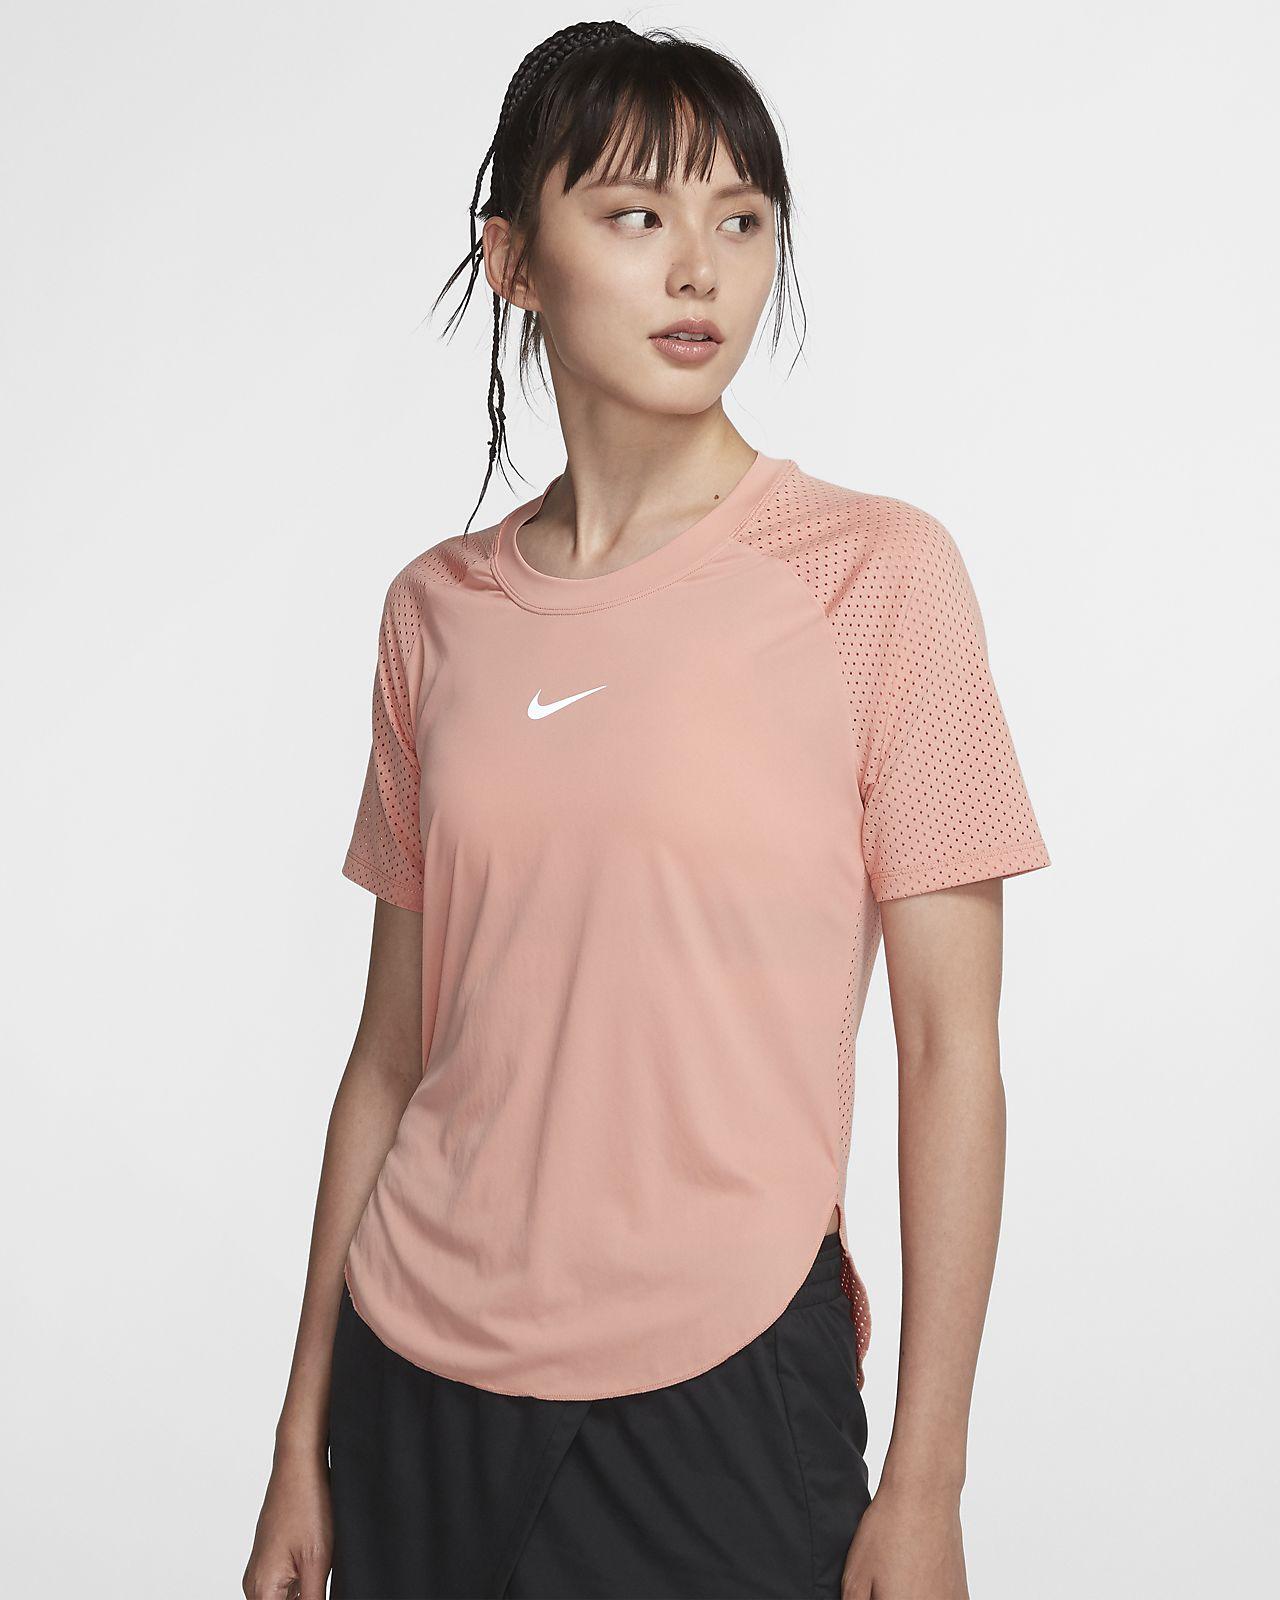 Nike City Sleek 女子短袖跑步上衣